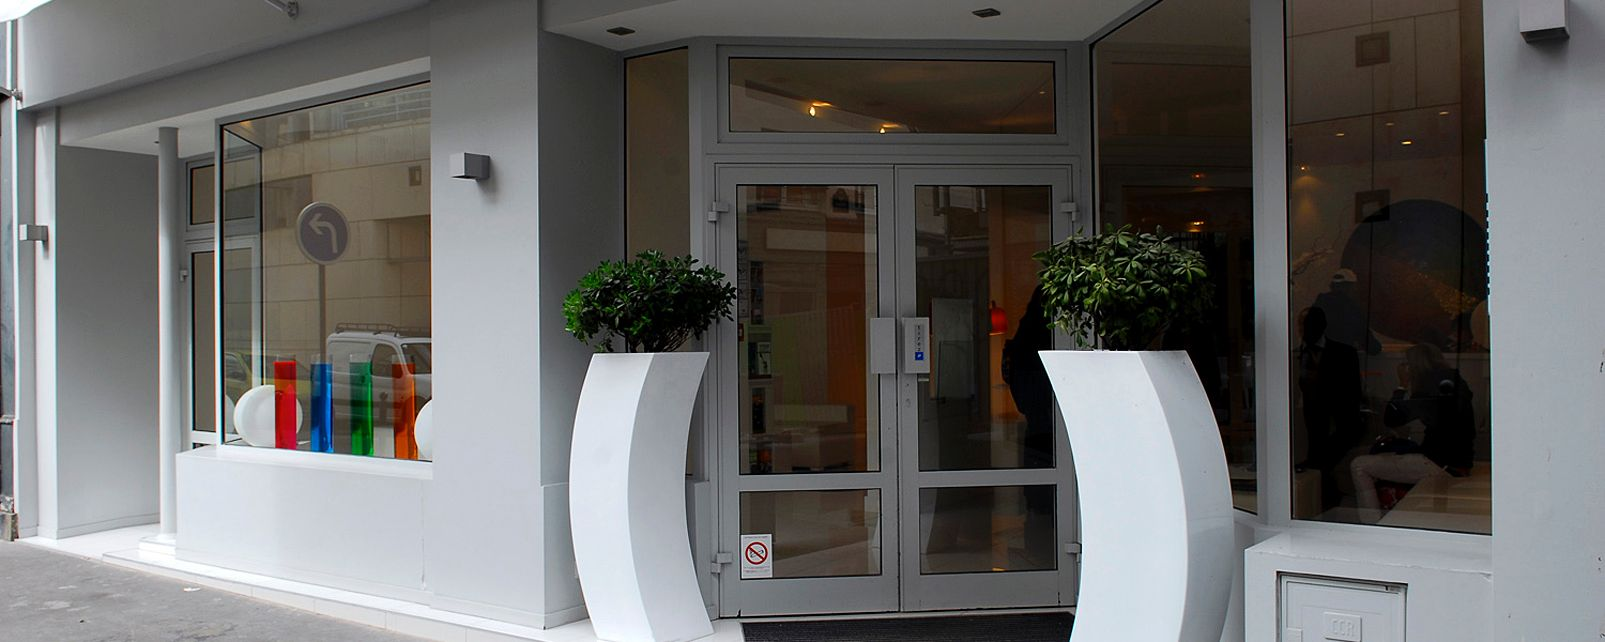 H tel color design for Color design hotel paris